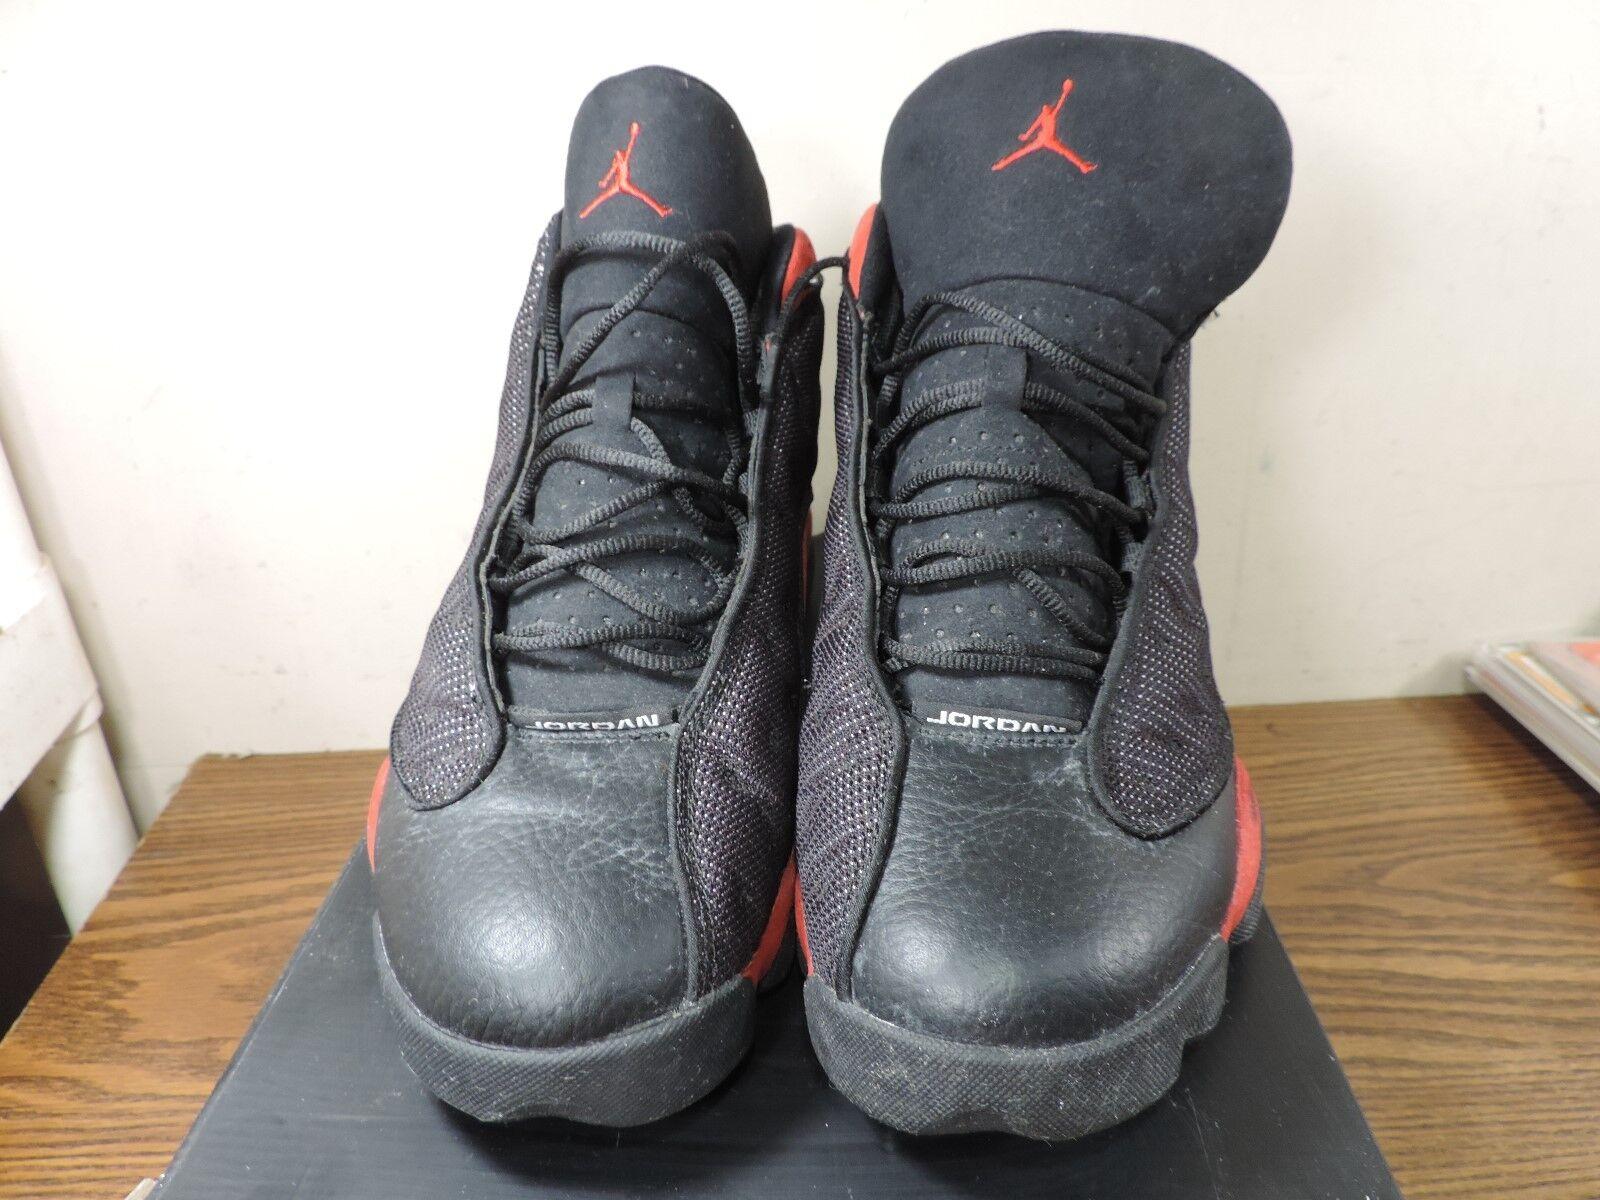 Air Jordan 13 'Bred' Retro Nike XIII Black Red 414571-010 Suede SZ 12